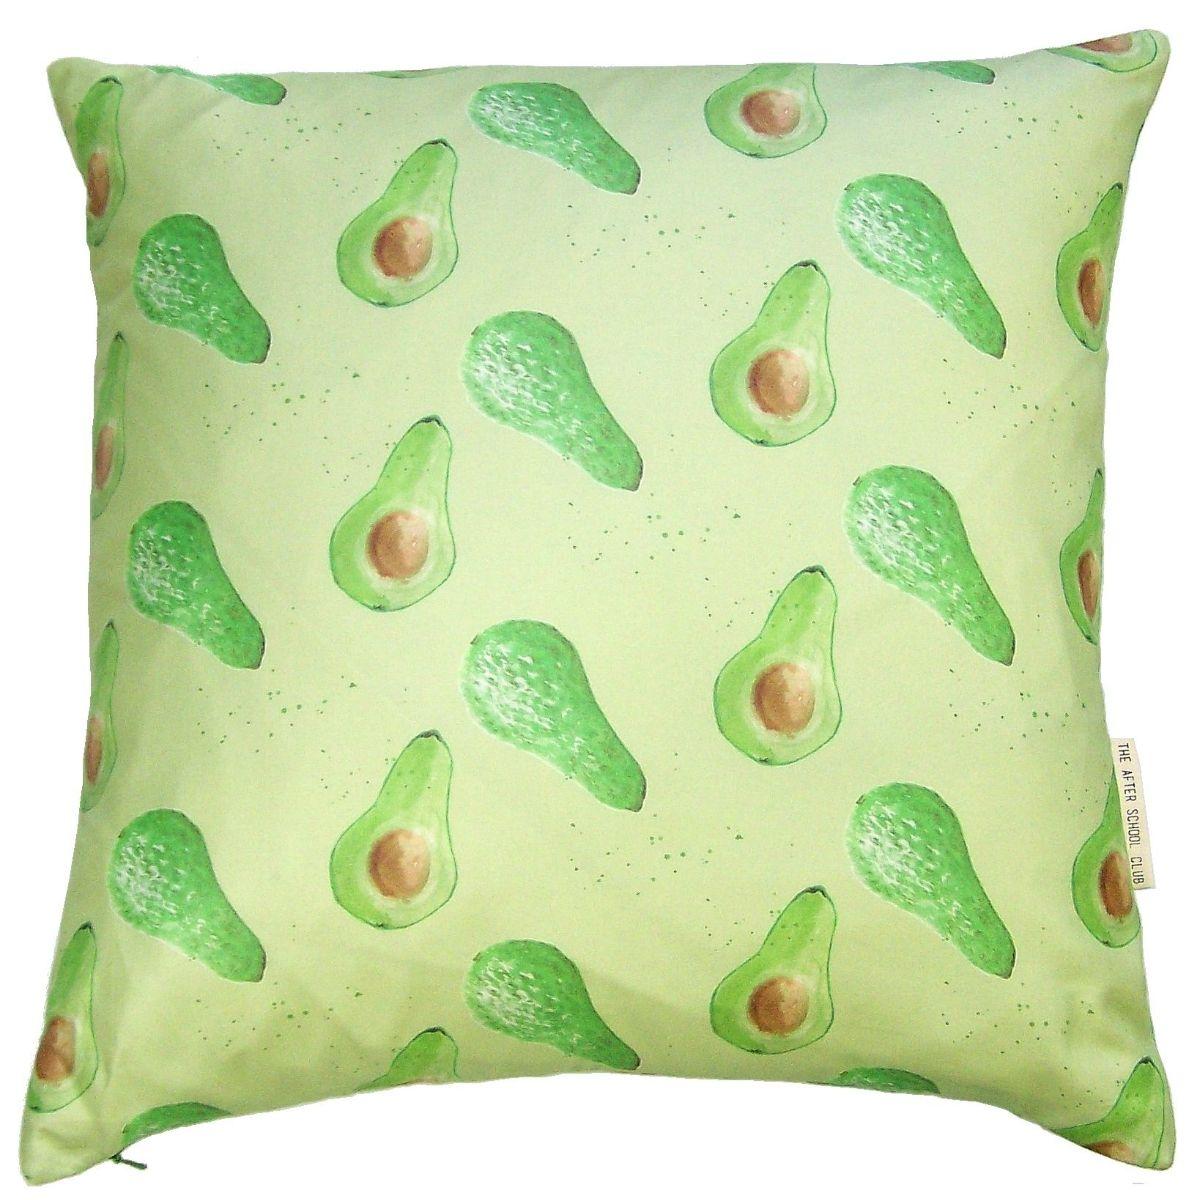 Avocado print cushion hand painted watercolour design